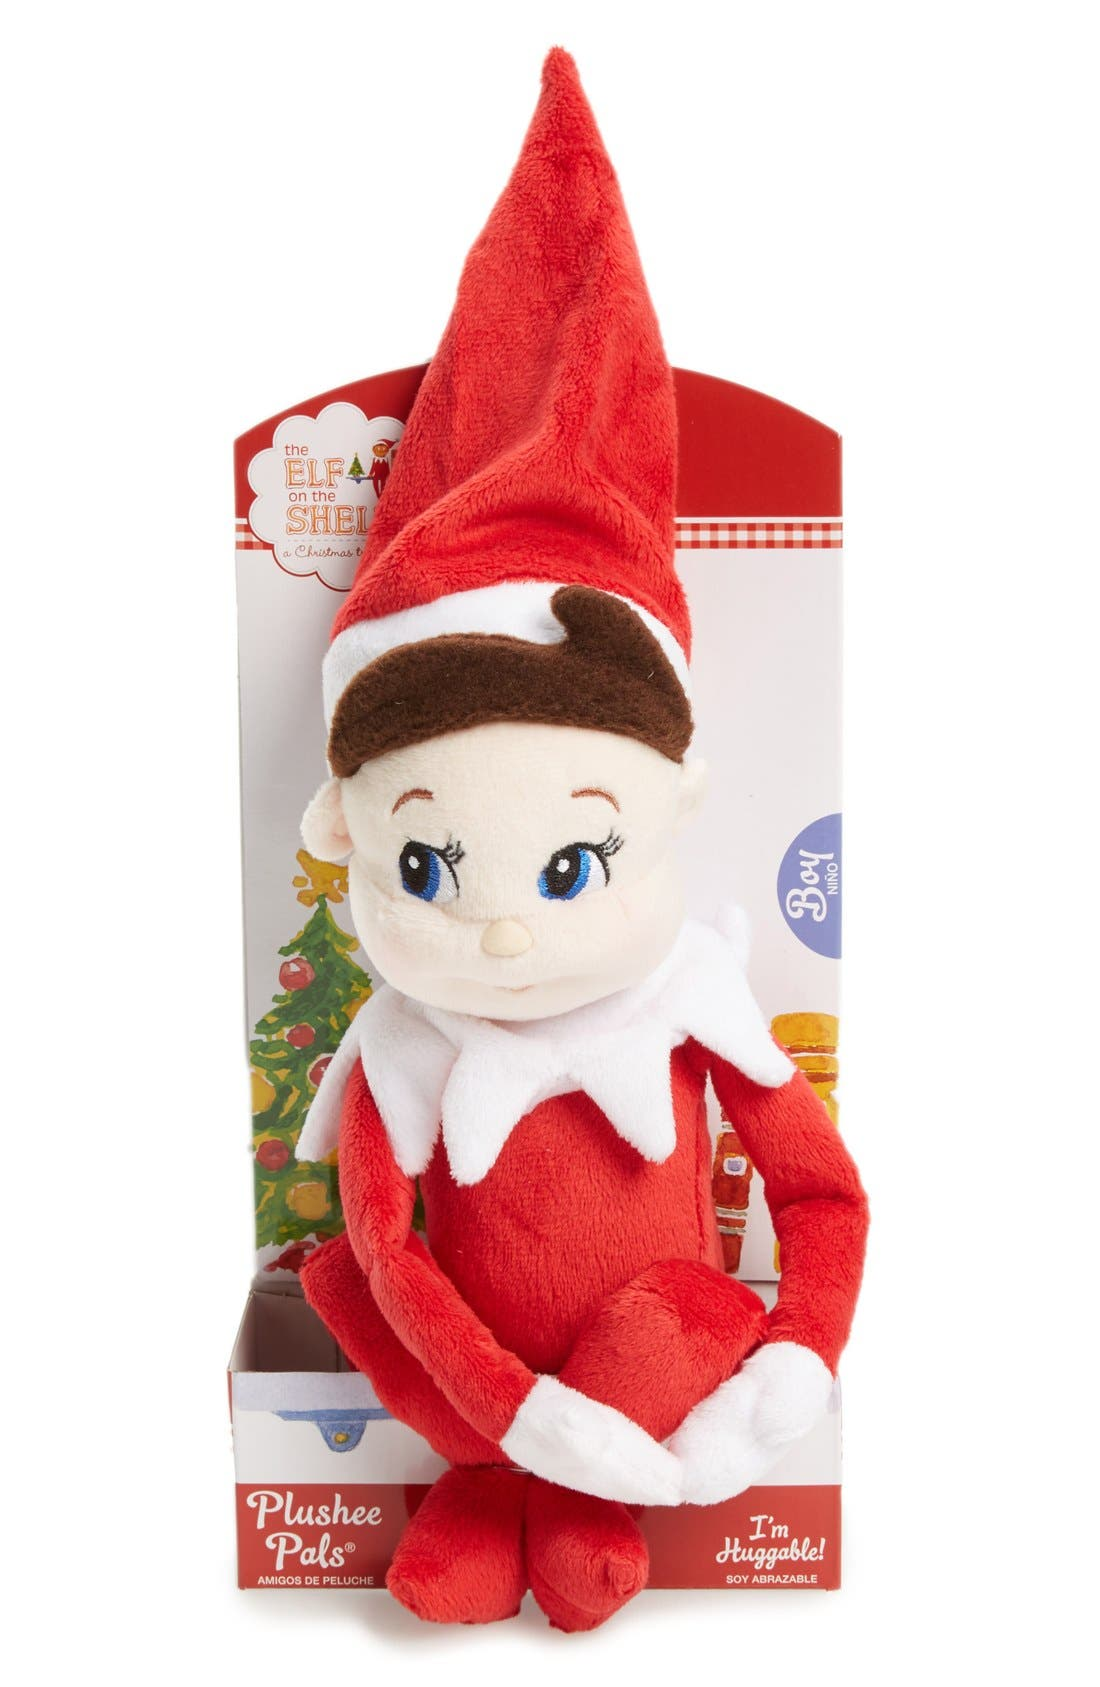 Elf on the Shelf Plushee Pals® Boy Scout Elf